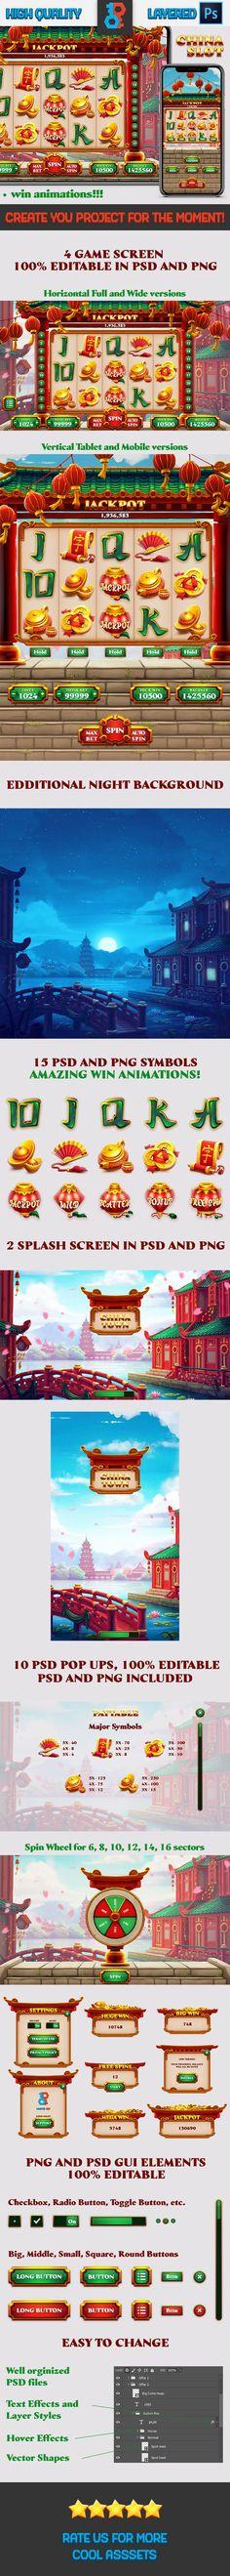 Game Gui, Game Icon, Splash Screen, Special Symbols, Casino Games, Colorful Fashion, Slot, Video Game, Animation